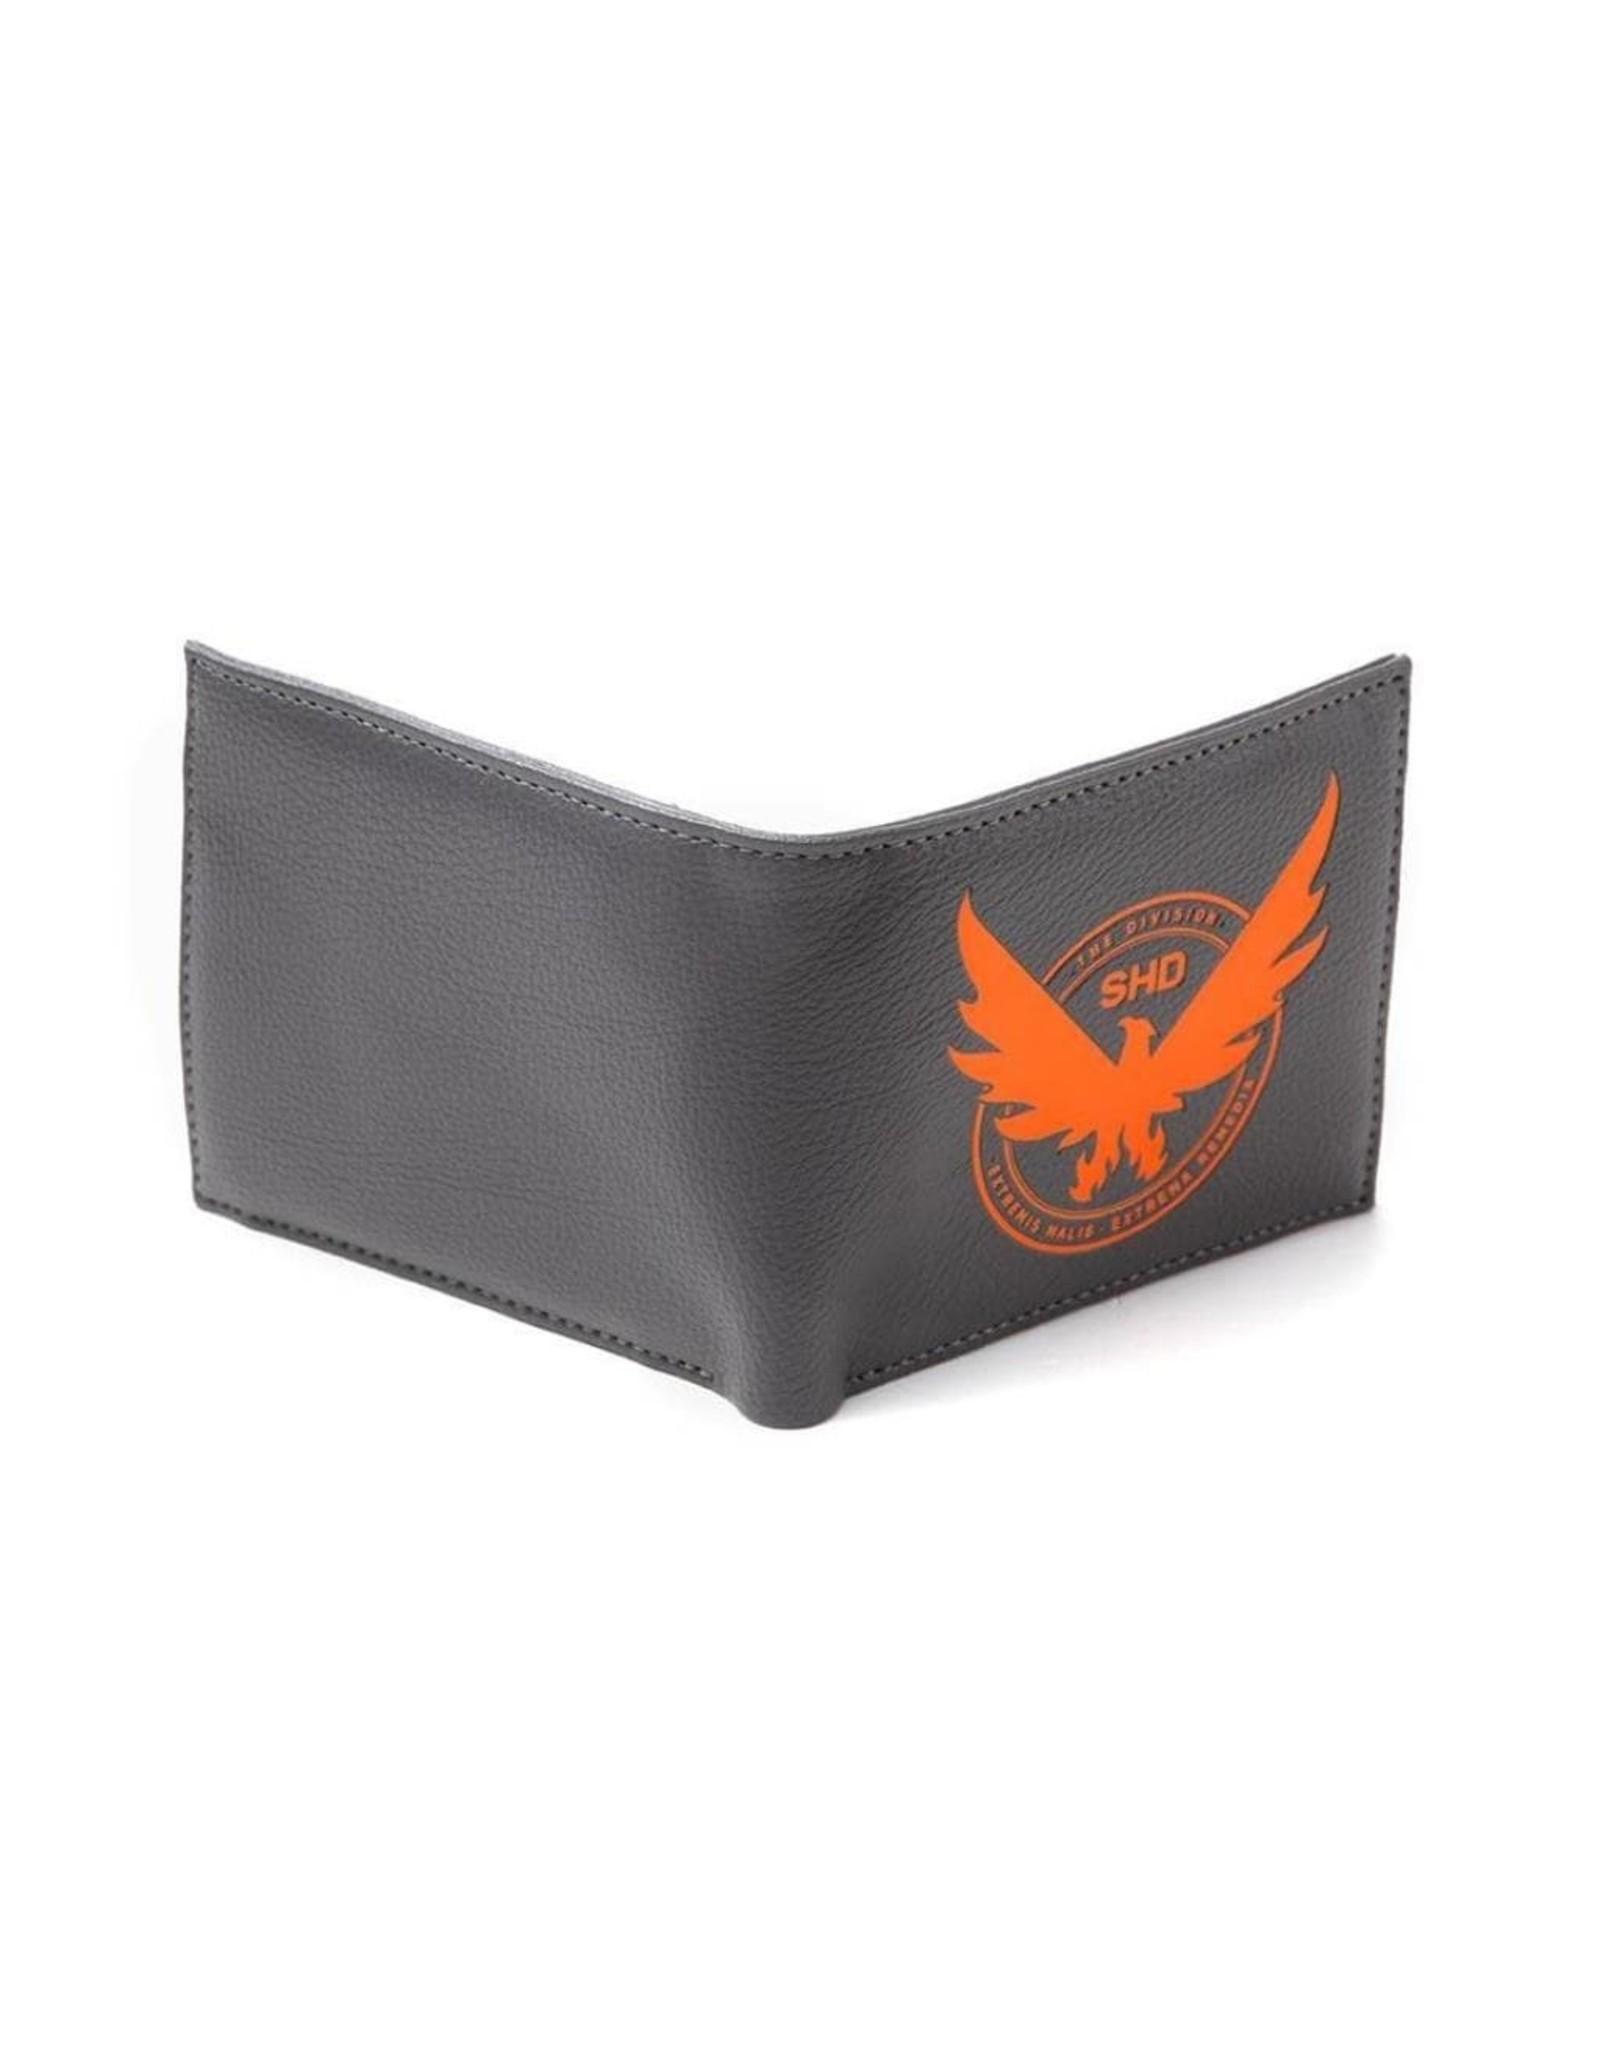 Division2 Merchandise wallets - Division 2 SHD wallet